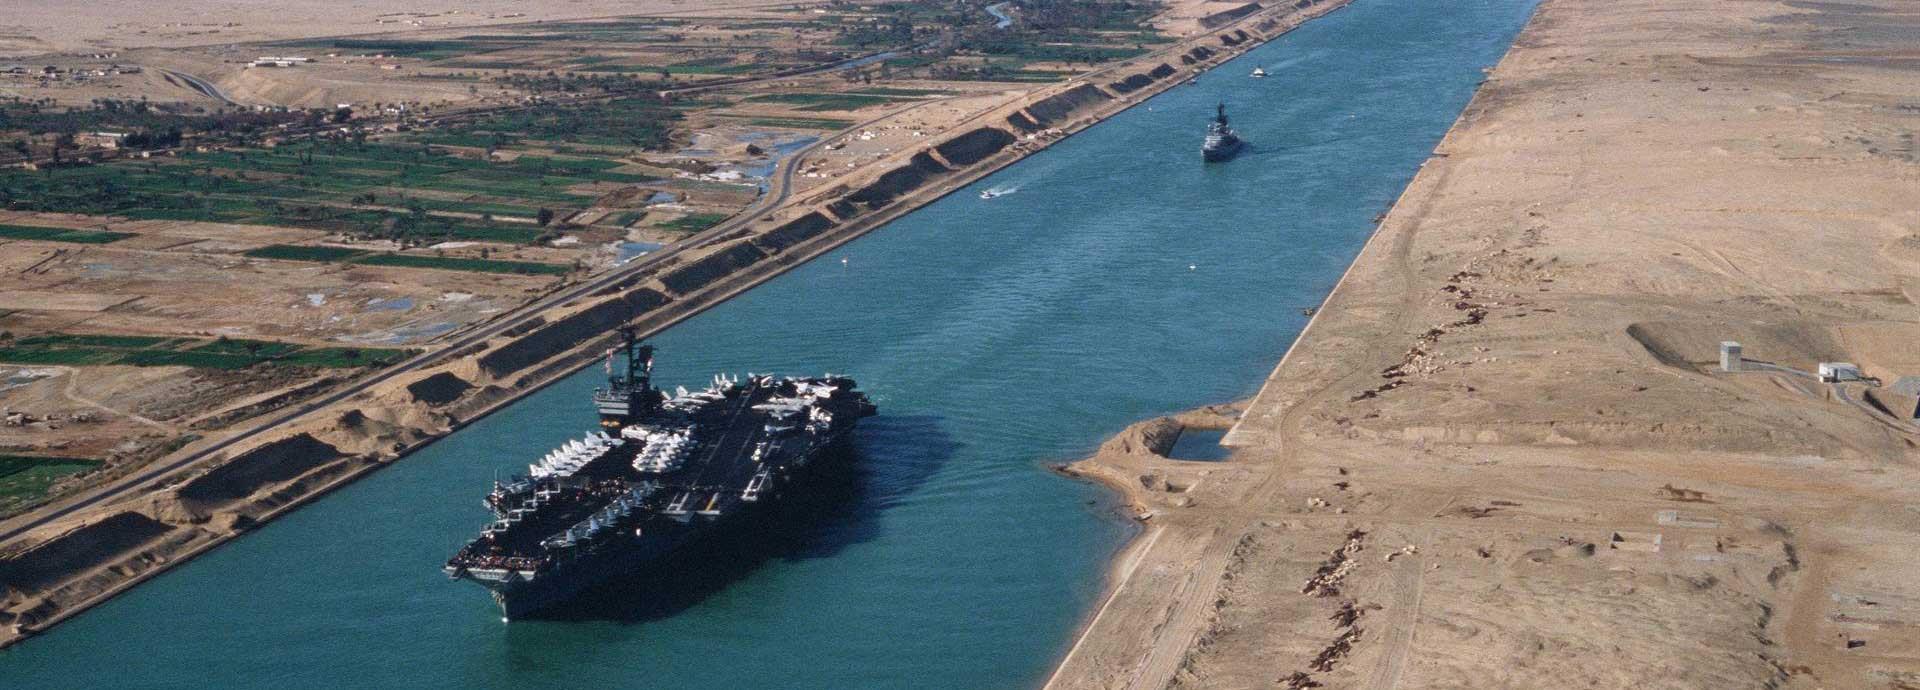 USS America in the Suez canal 1981